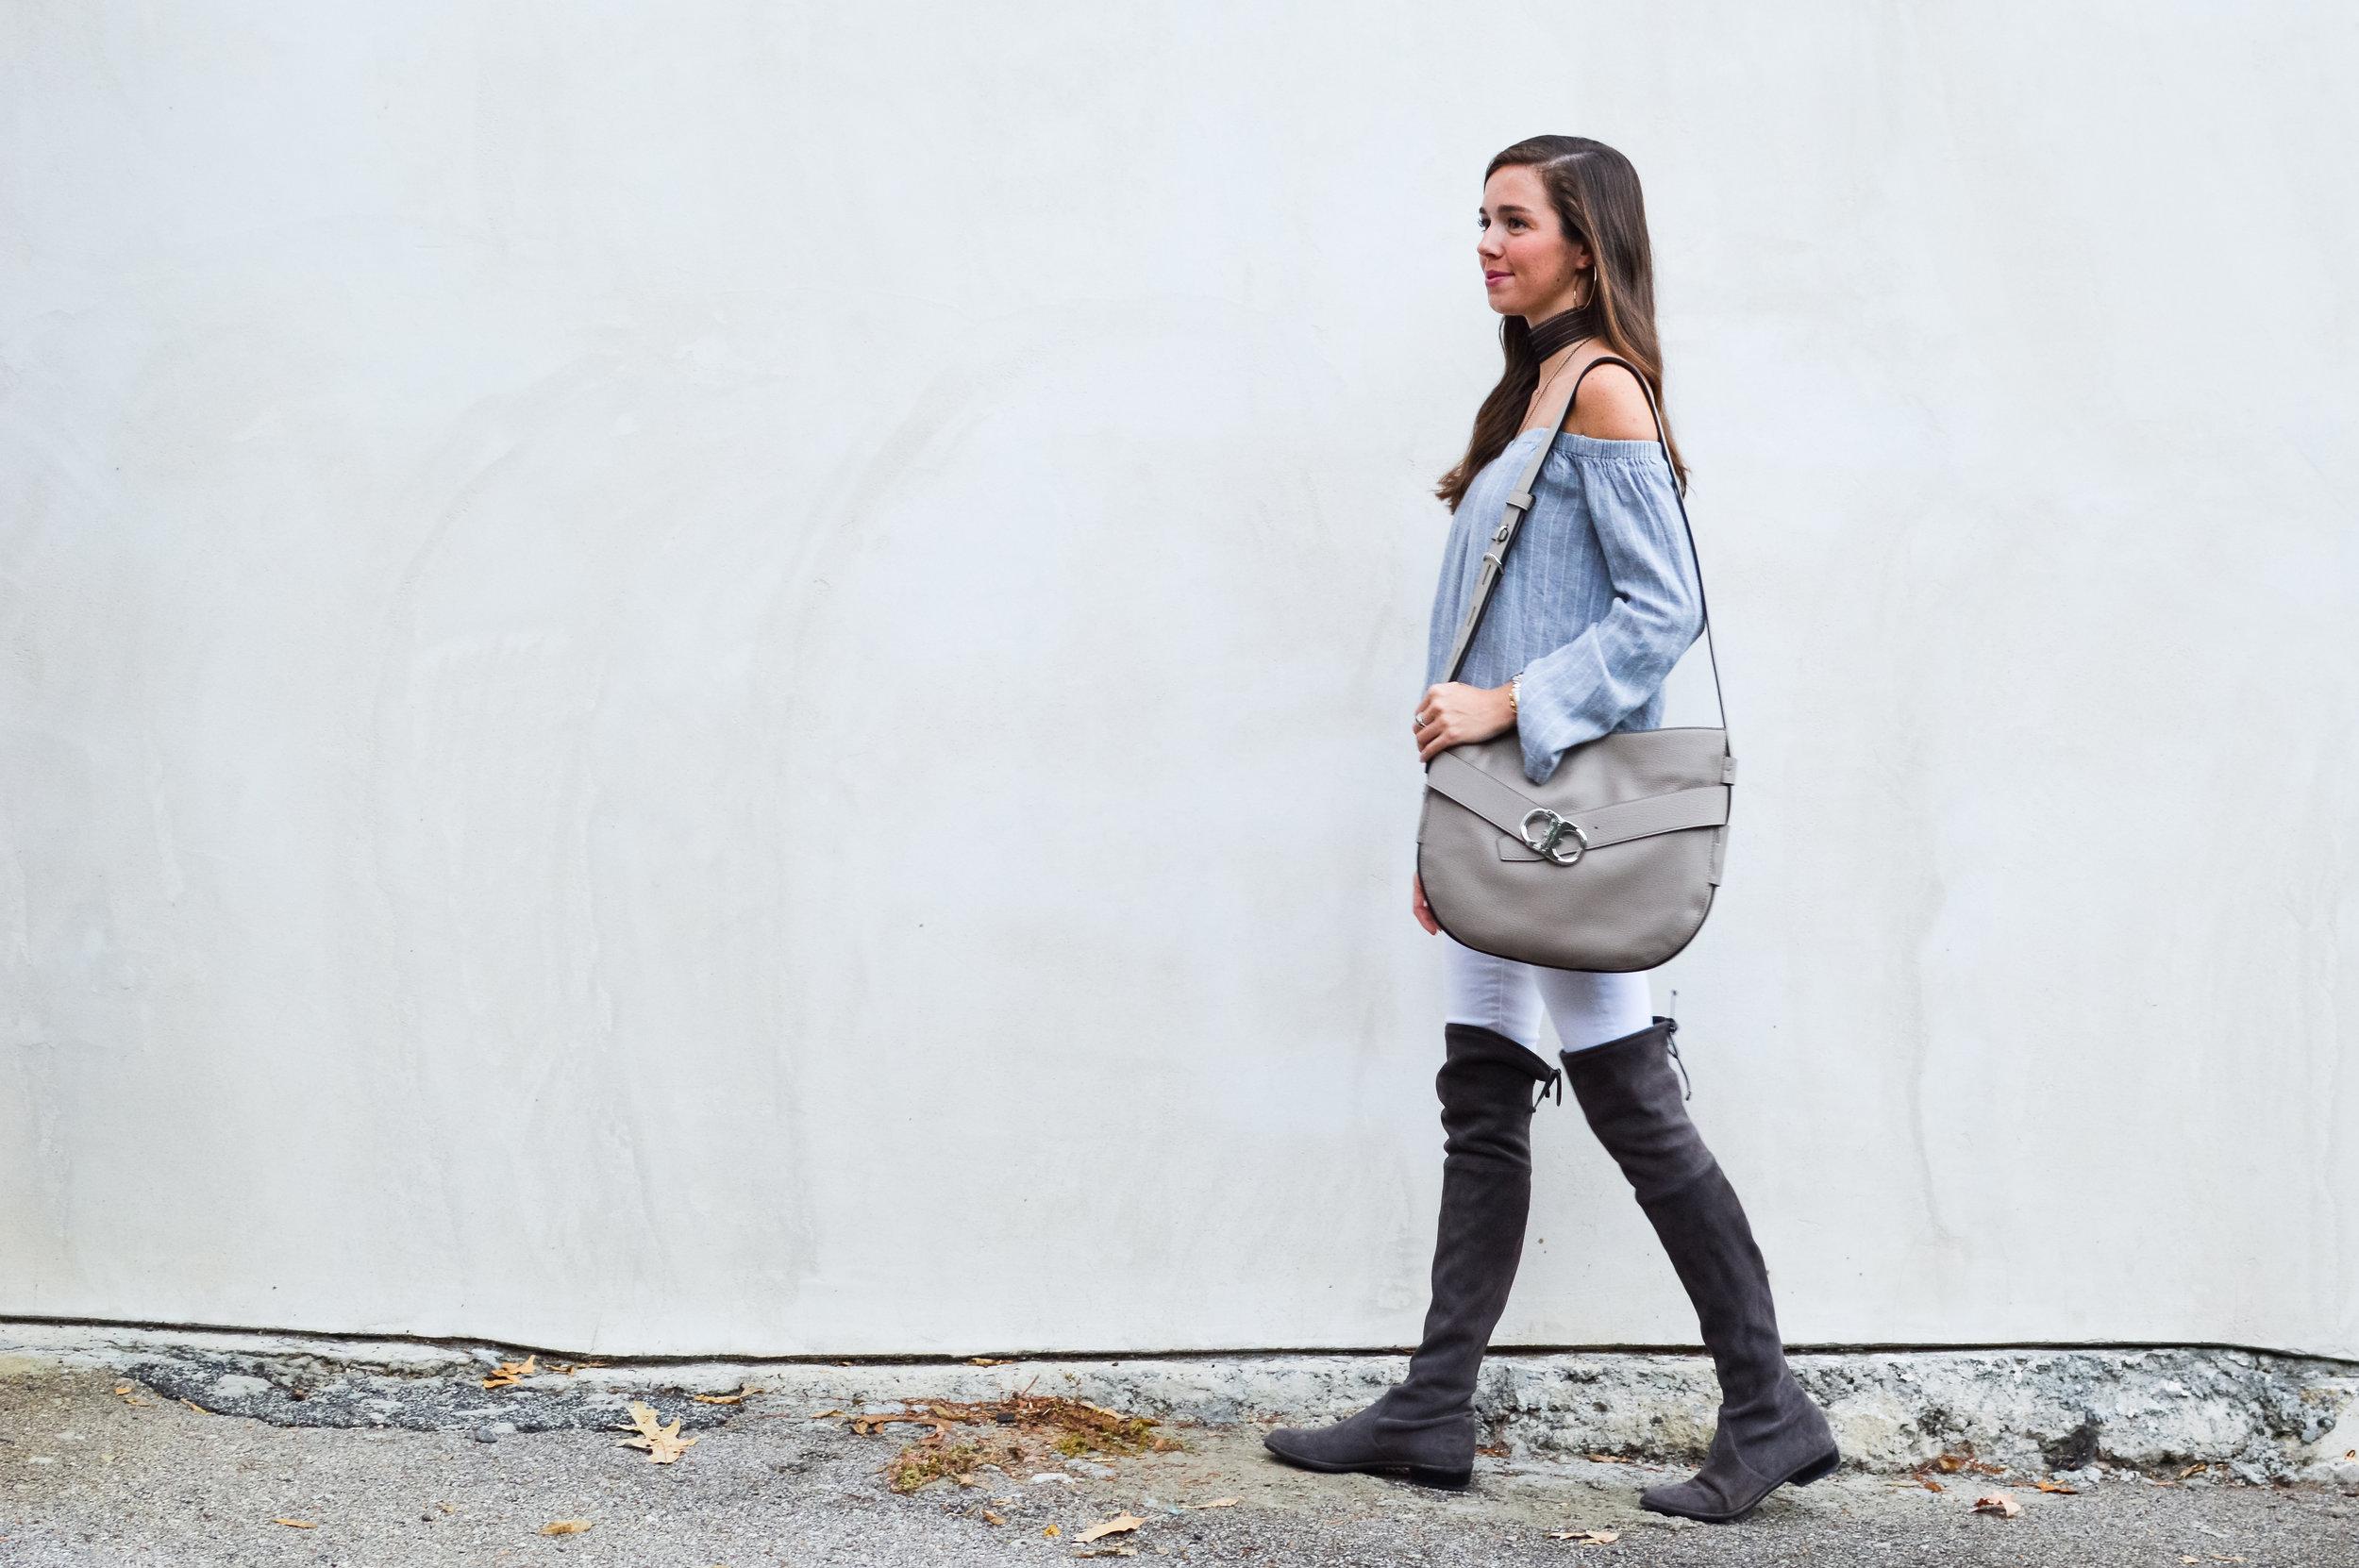 fashion blogger lcb style stuart weitzman tory burch over the knee fall fashion (14 of 29).jpg